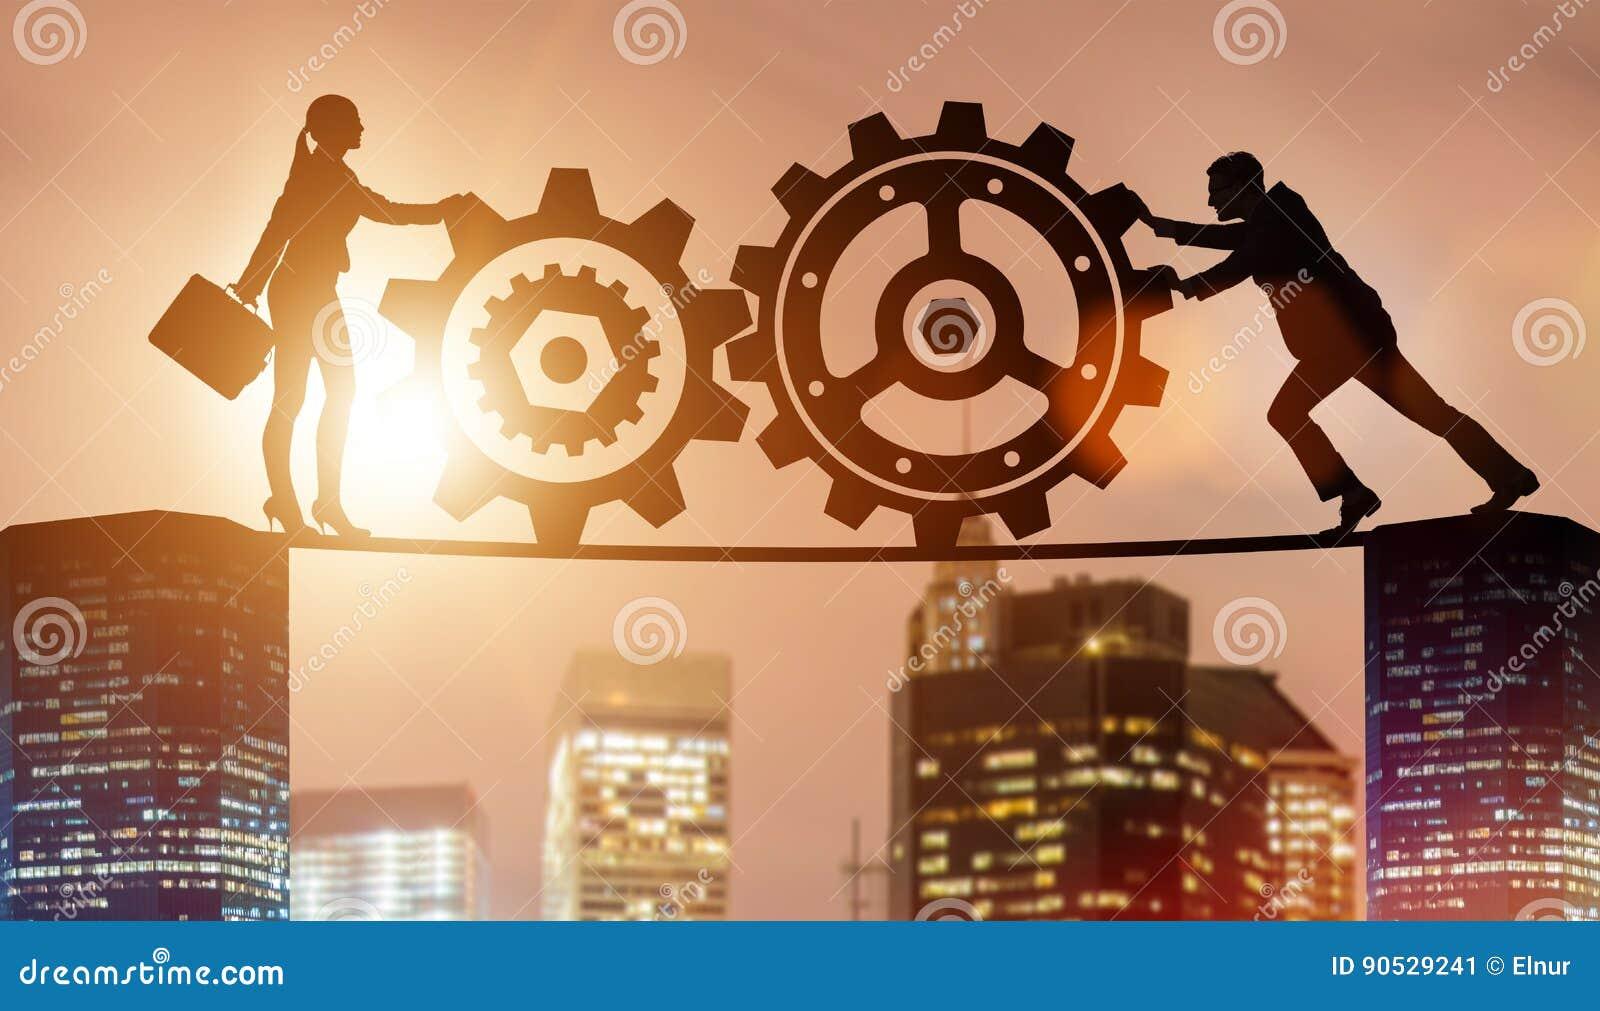 Business teamwork example powerpoint presentation powerpoint.